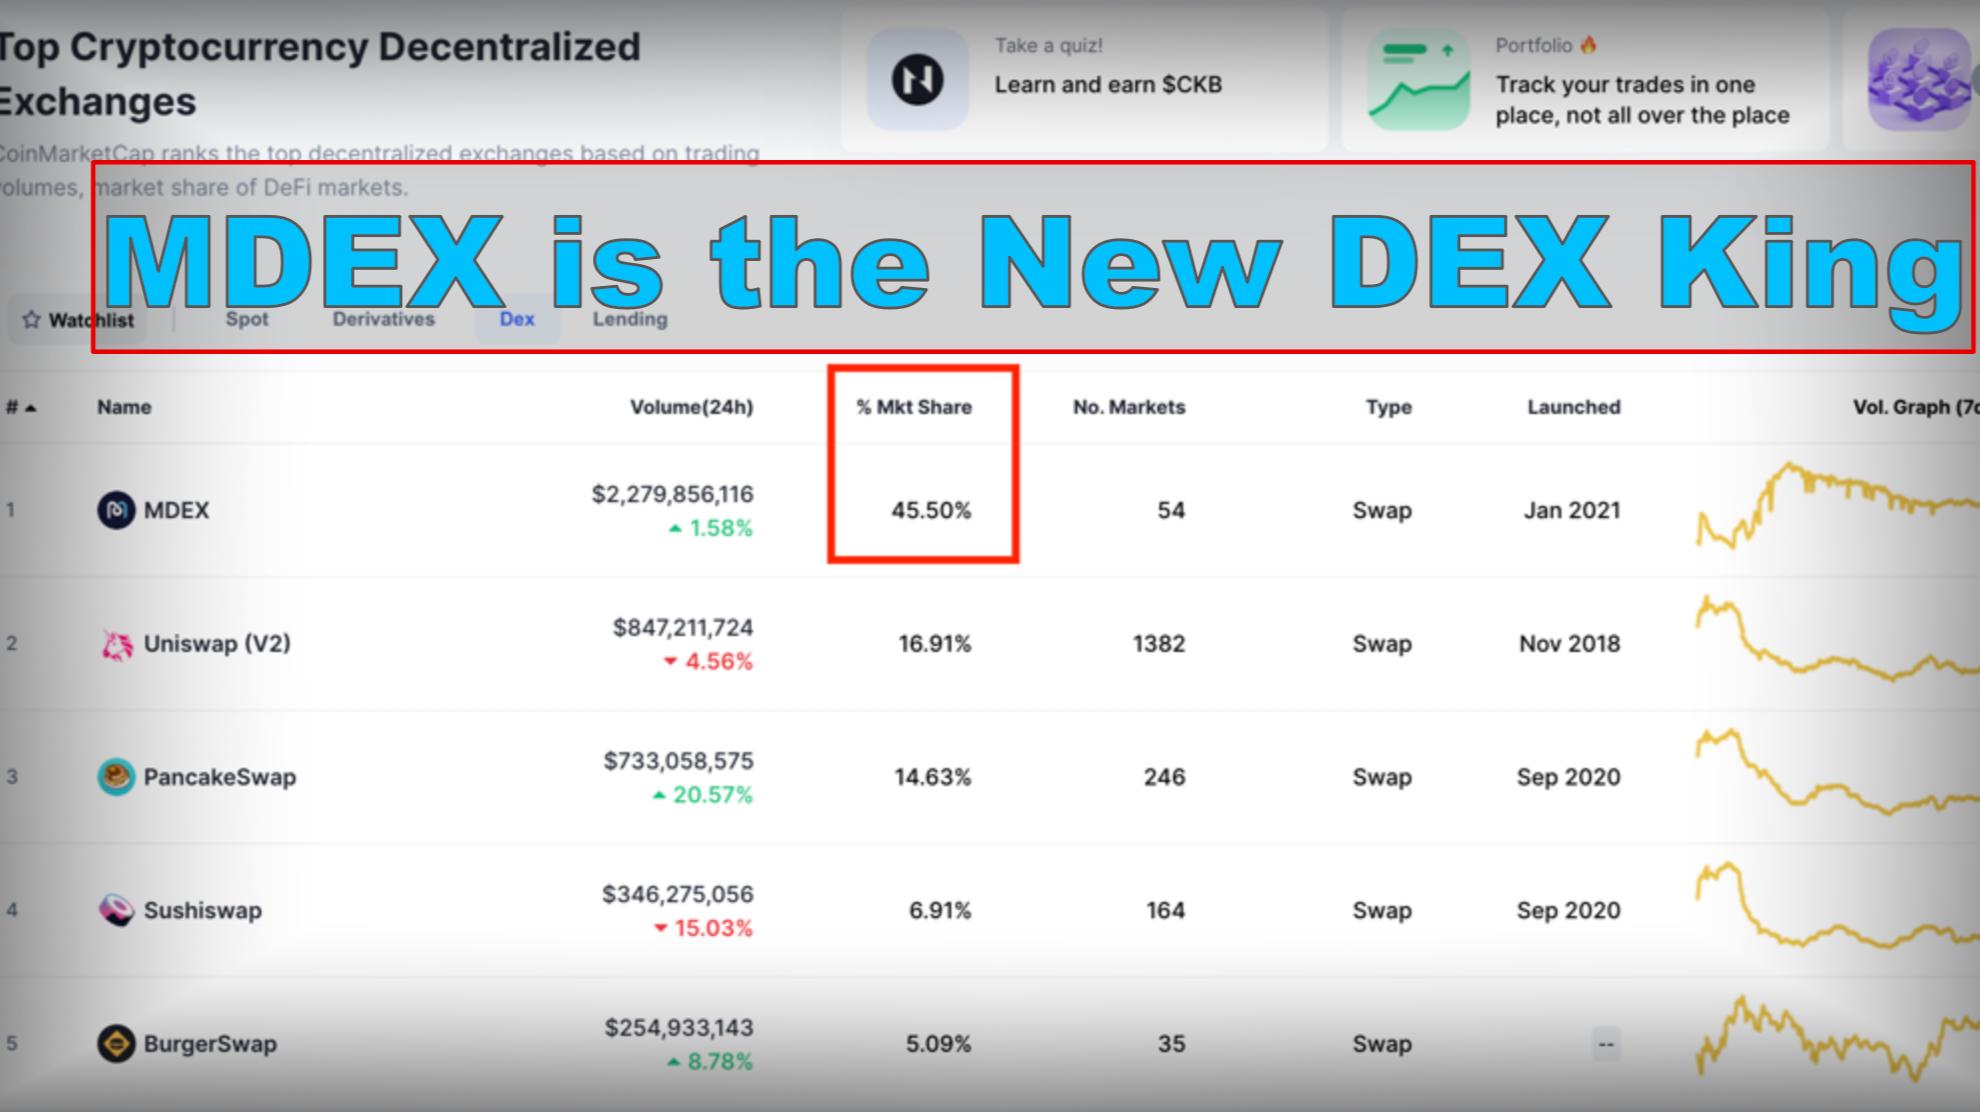 Source: CoinMarketCap - MDEXCaptures 45.5% of the Market Share